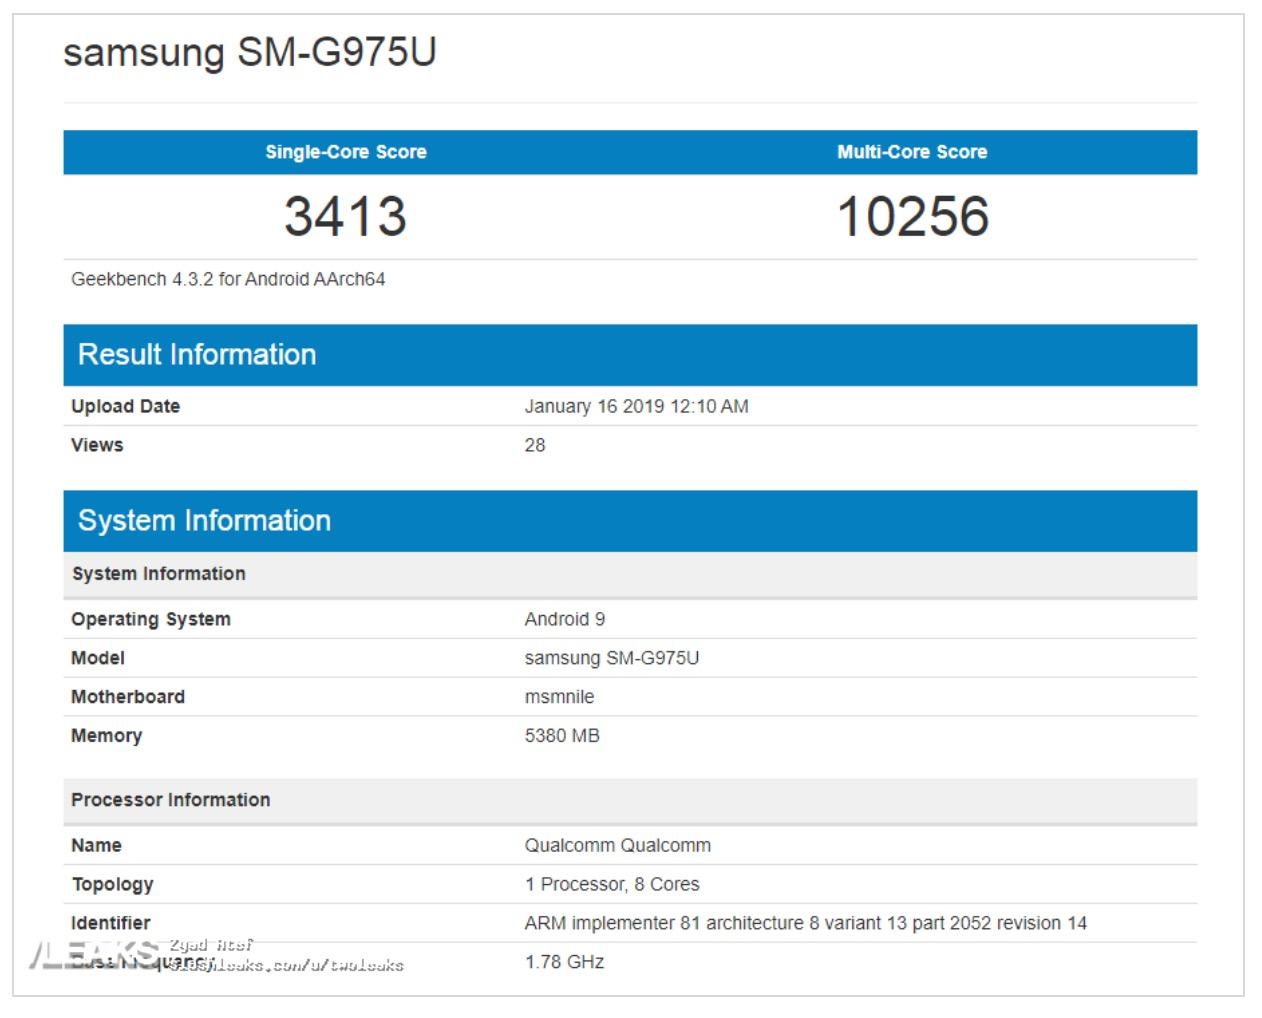 Galaxy S10 Plus Geekbench Leaks Img 1